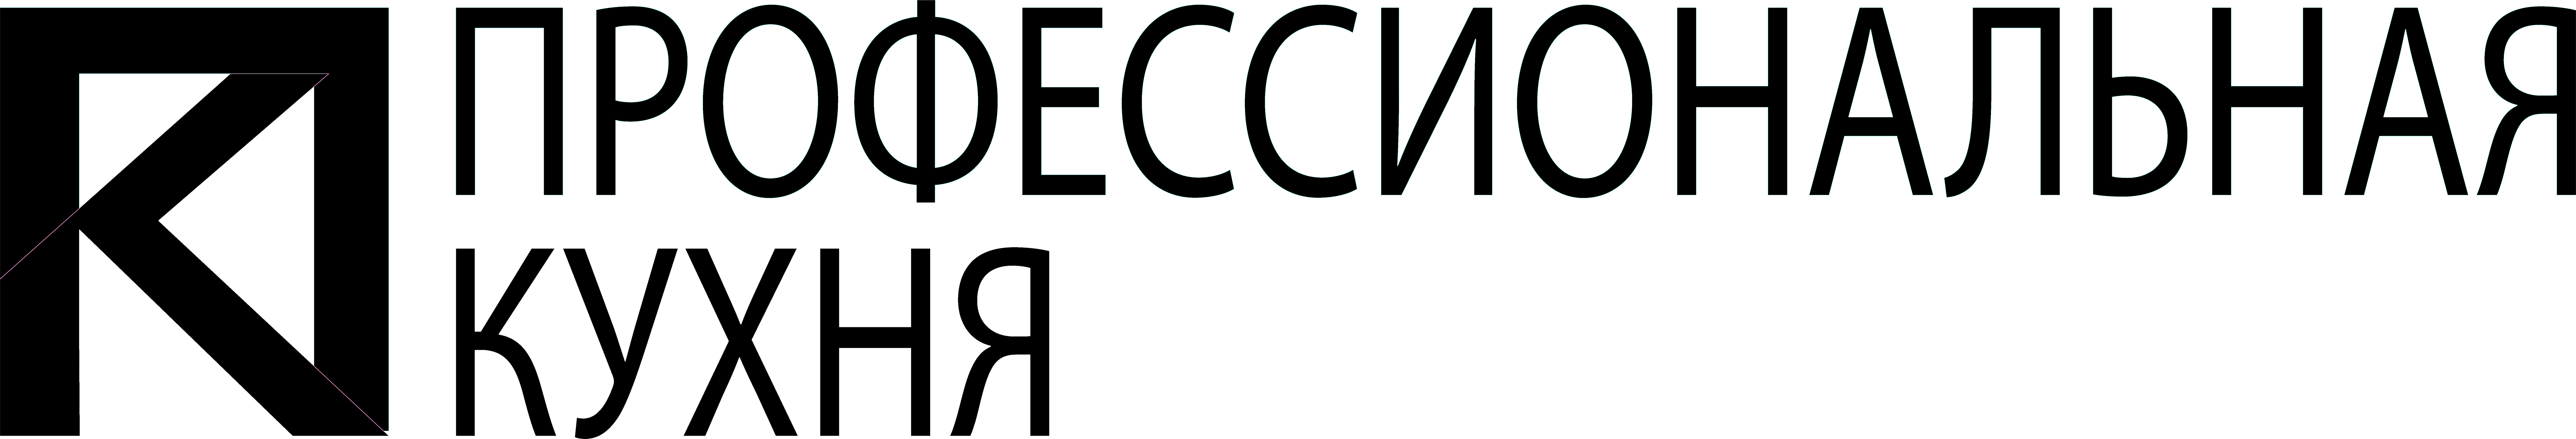 Funitor logo